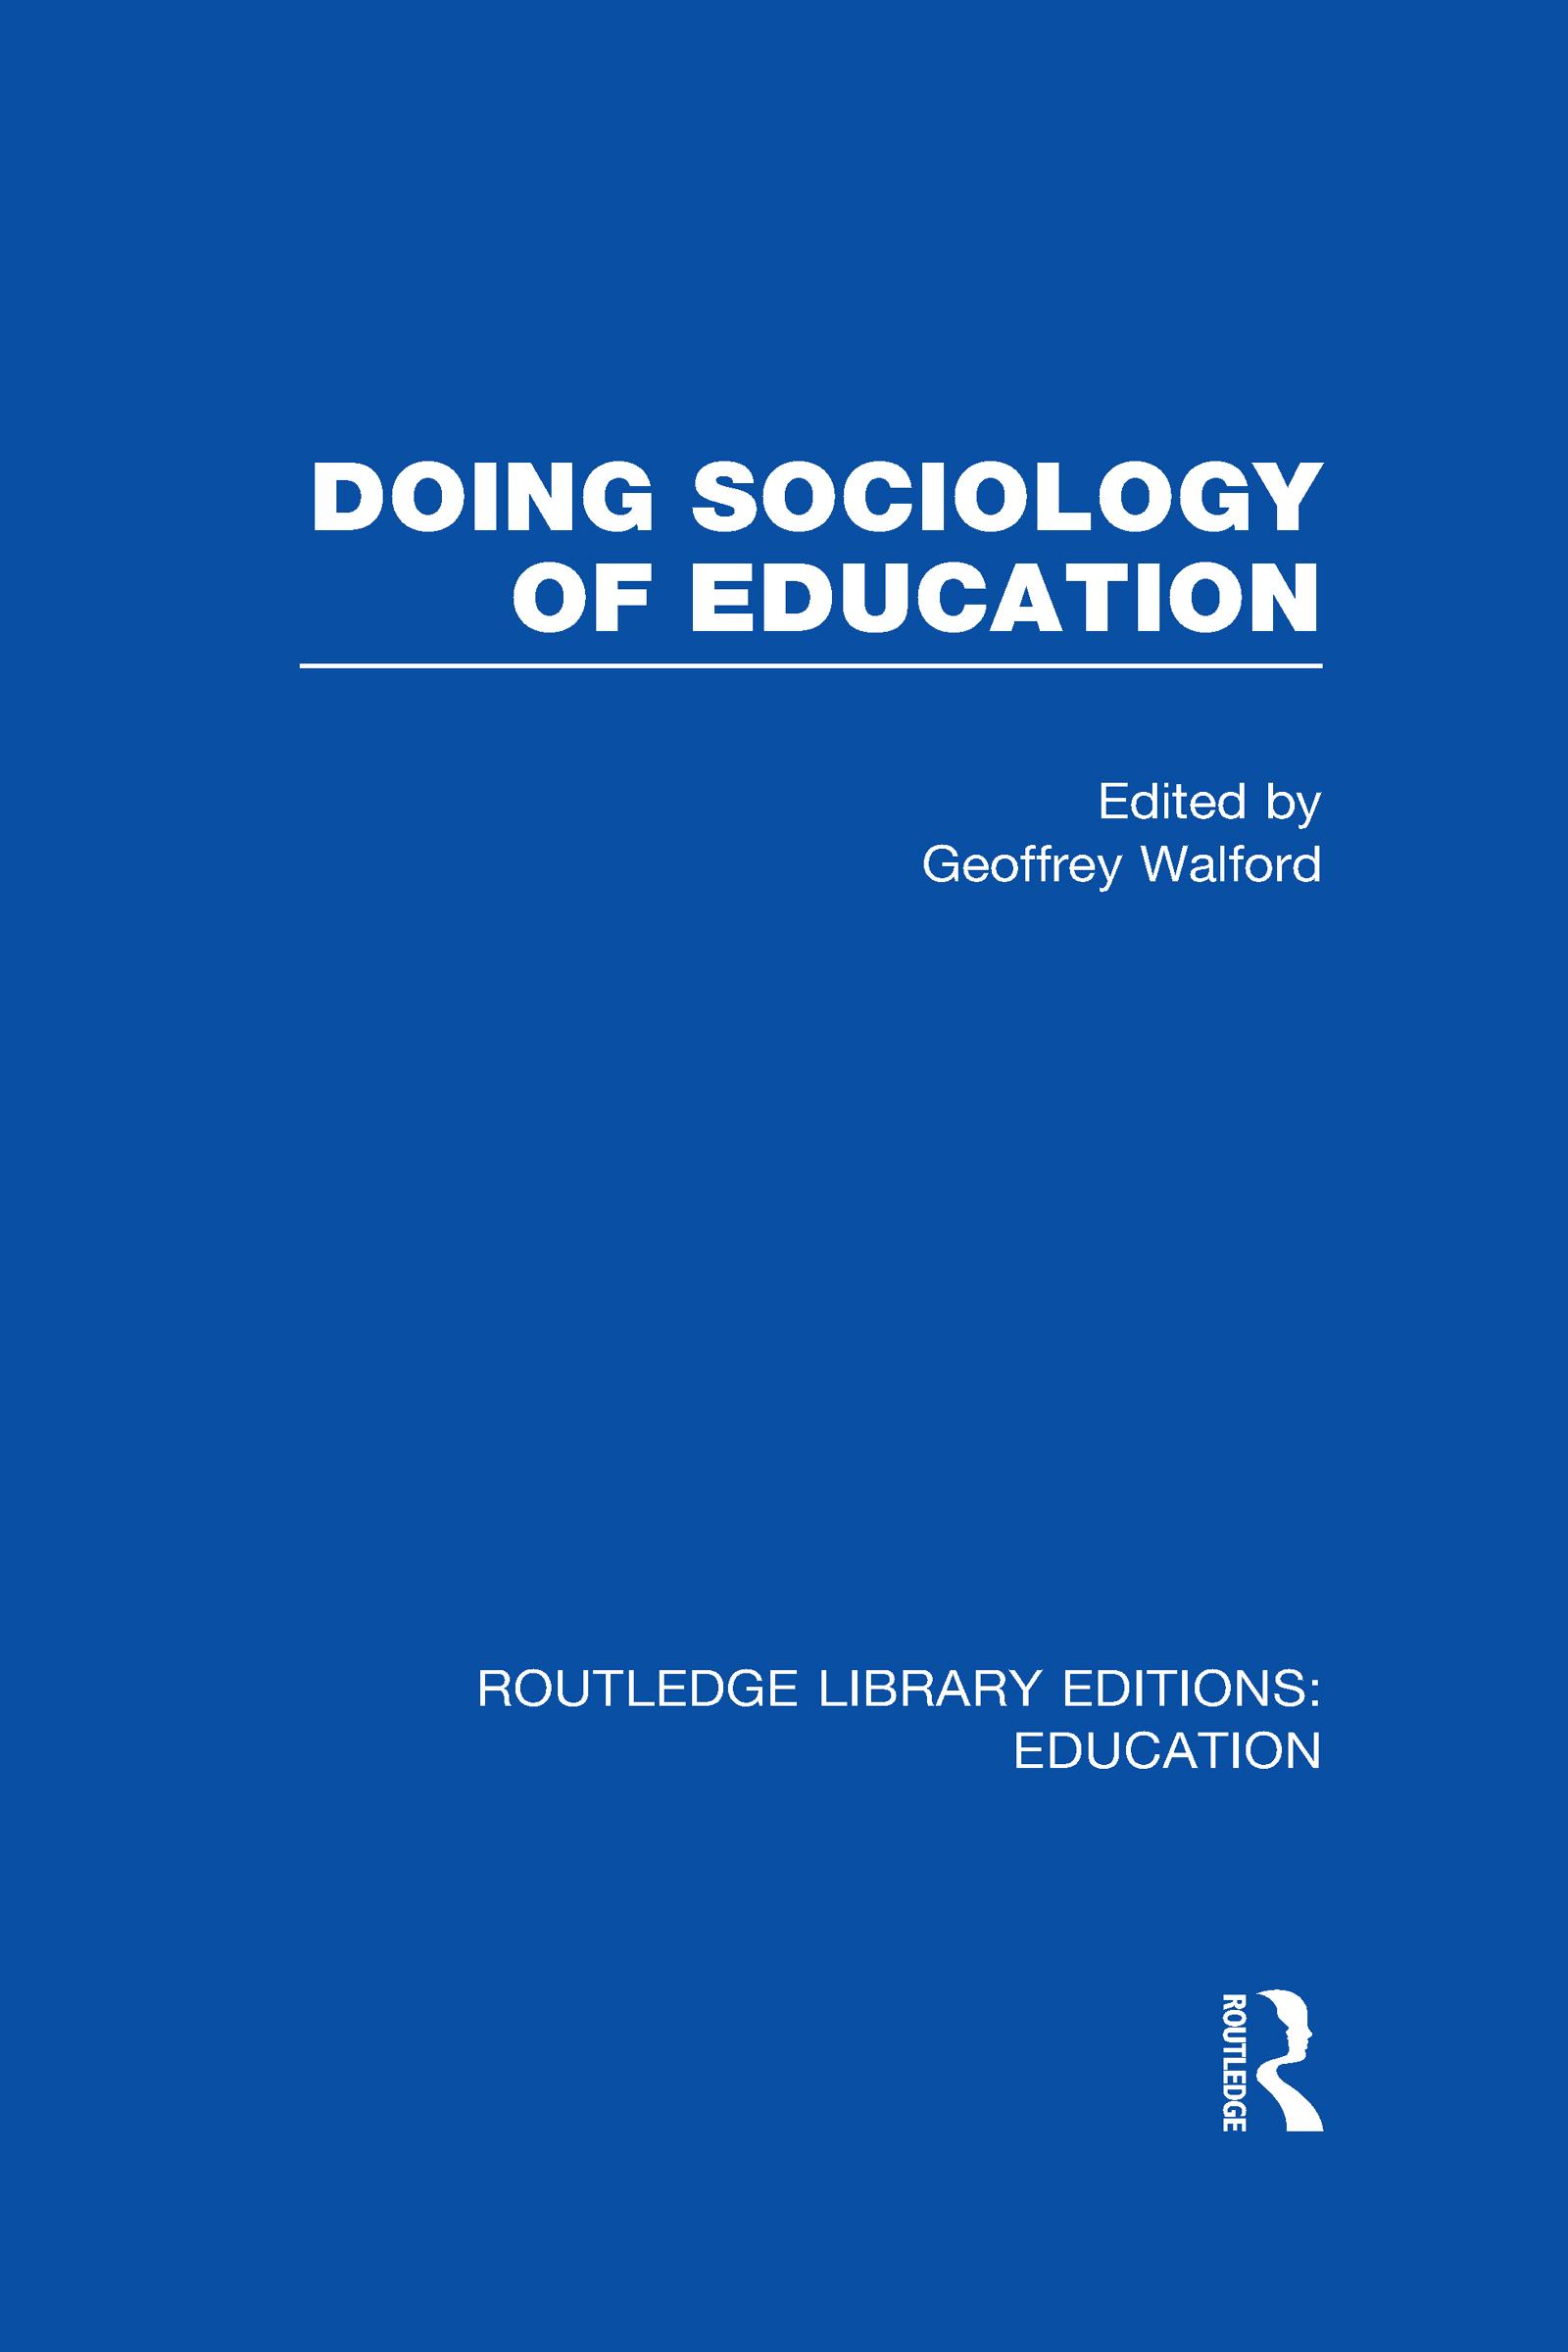 Doing Sociology of Education (RLE Edu L) (Hardback) book cover